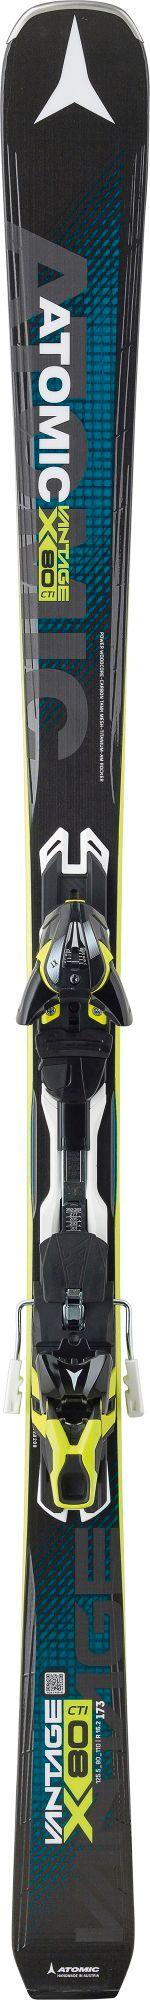 Vantage x 80 CTI All-Mountain Ski mehrfarbig, Größe 180